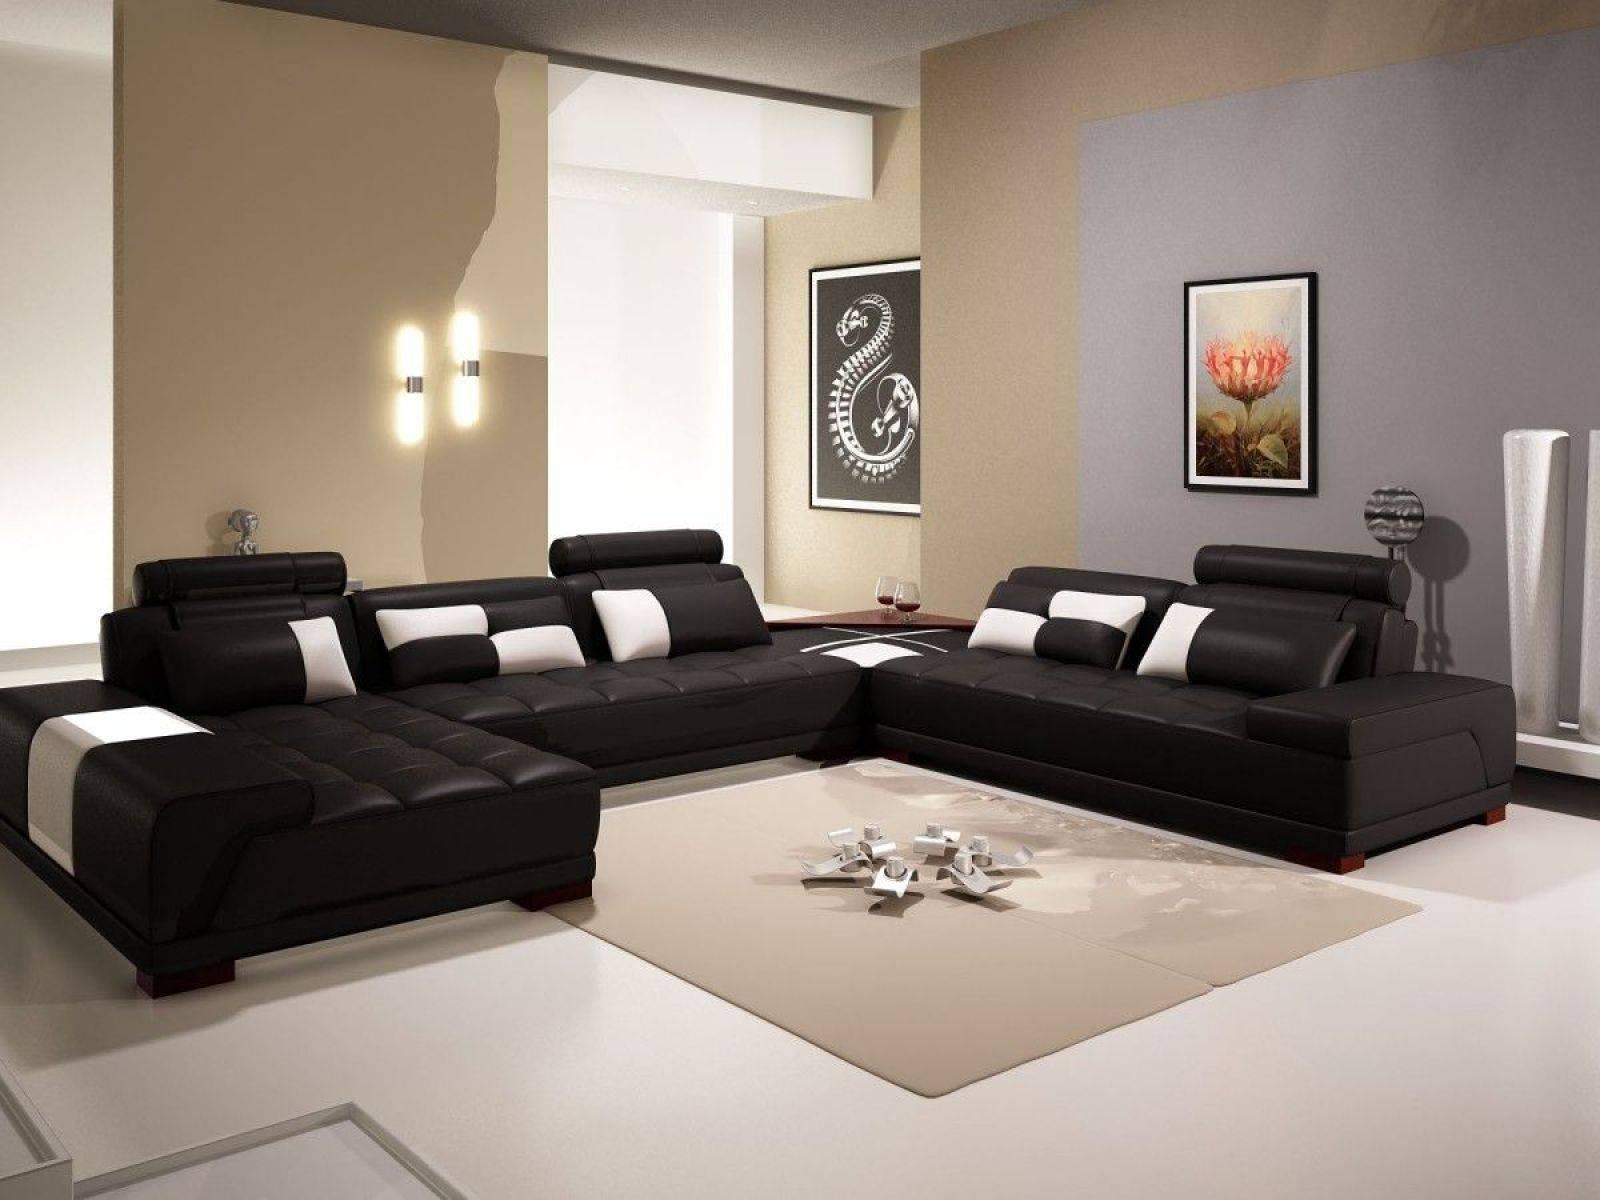 ☆▻ Sofa : 28 3032C2 Inside 89 Wonderful Black And White Sofa Set for White And Black Sofas (Image 30 of 30)